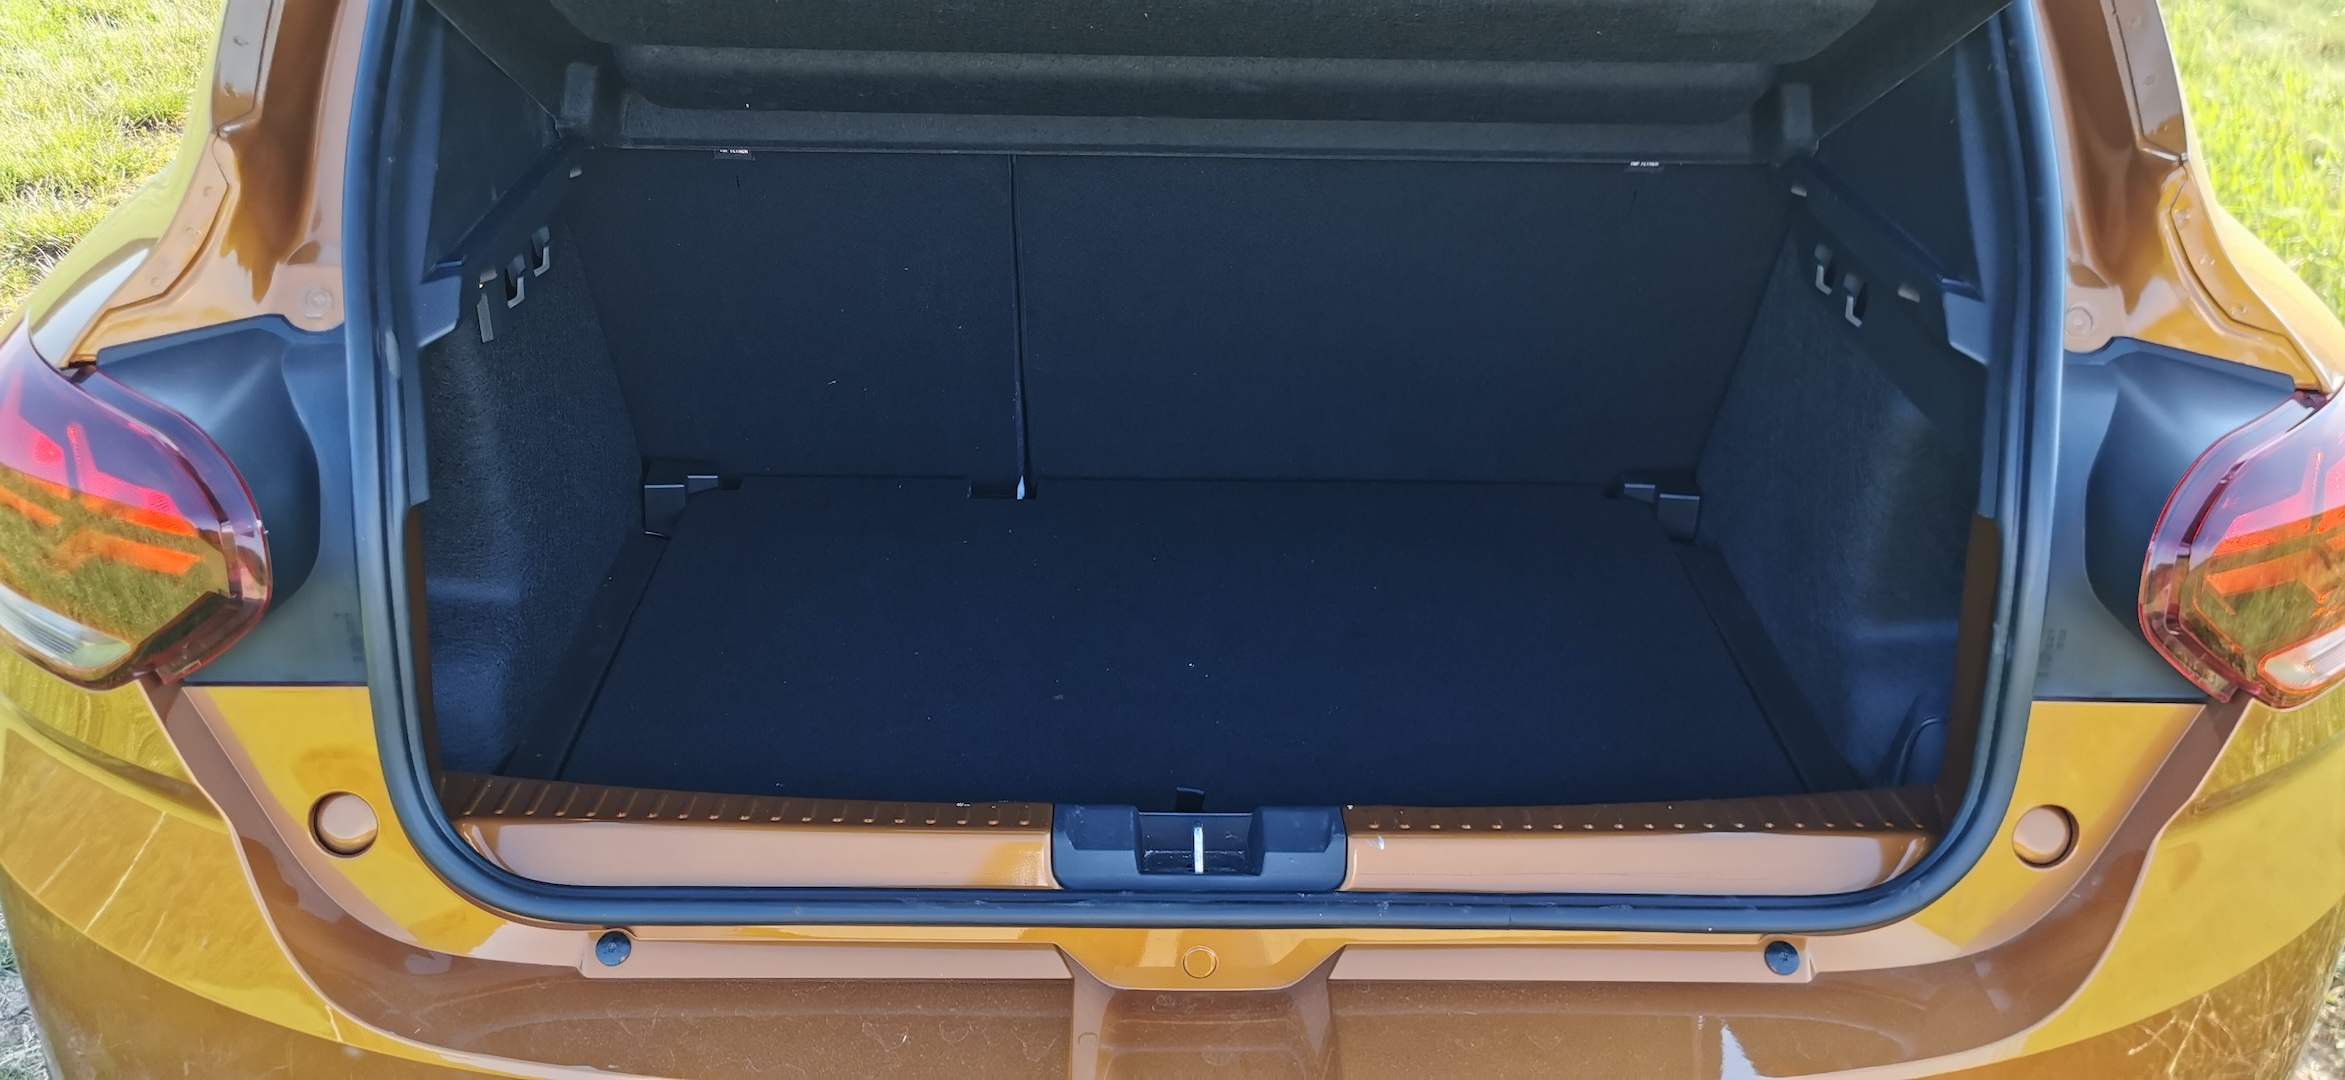 Dacia Sandero Stepway 1,0 TCe LPG - zavazadlový prostor